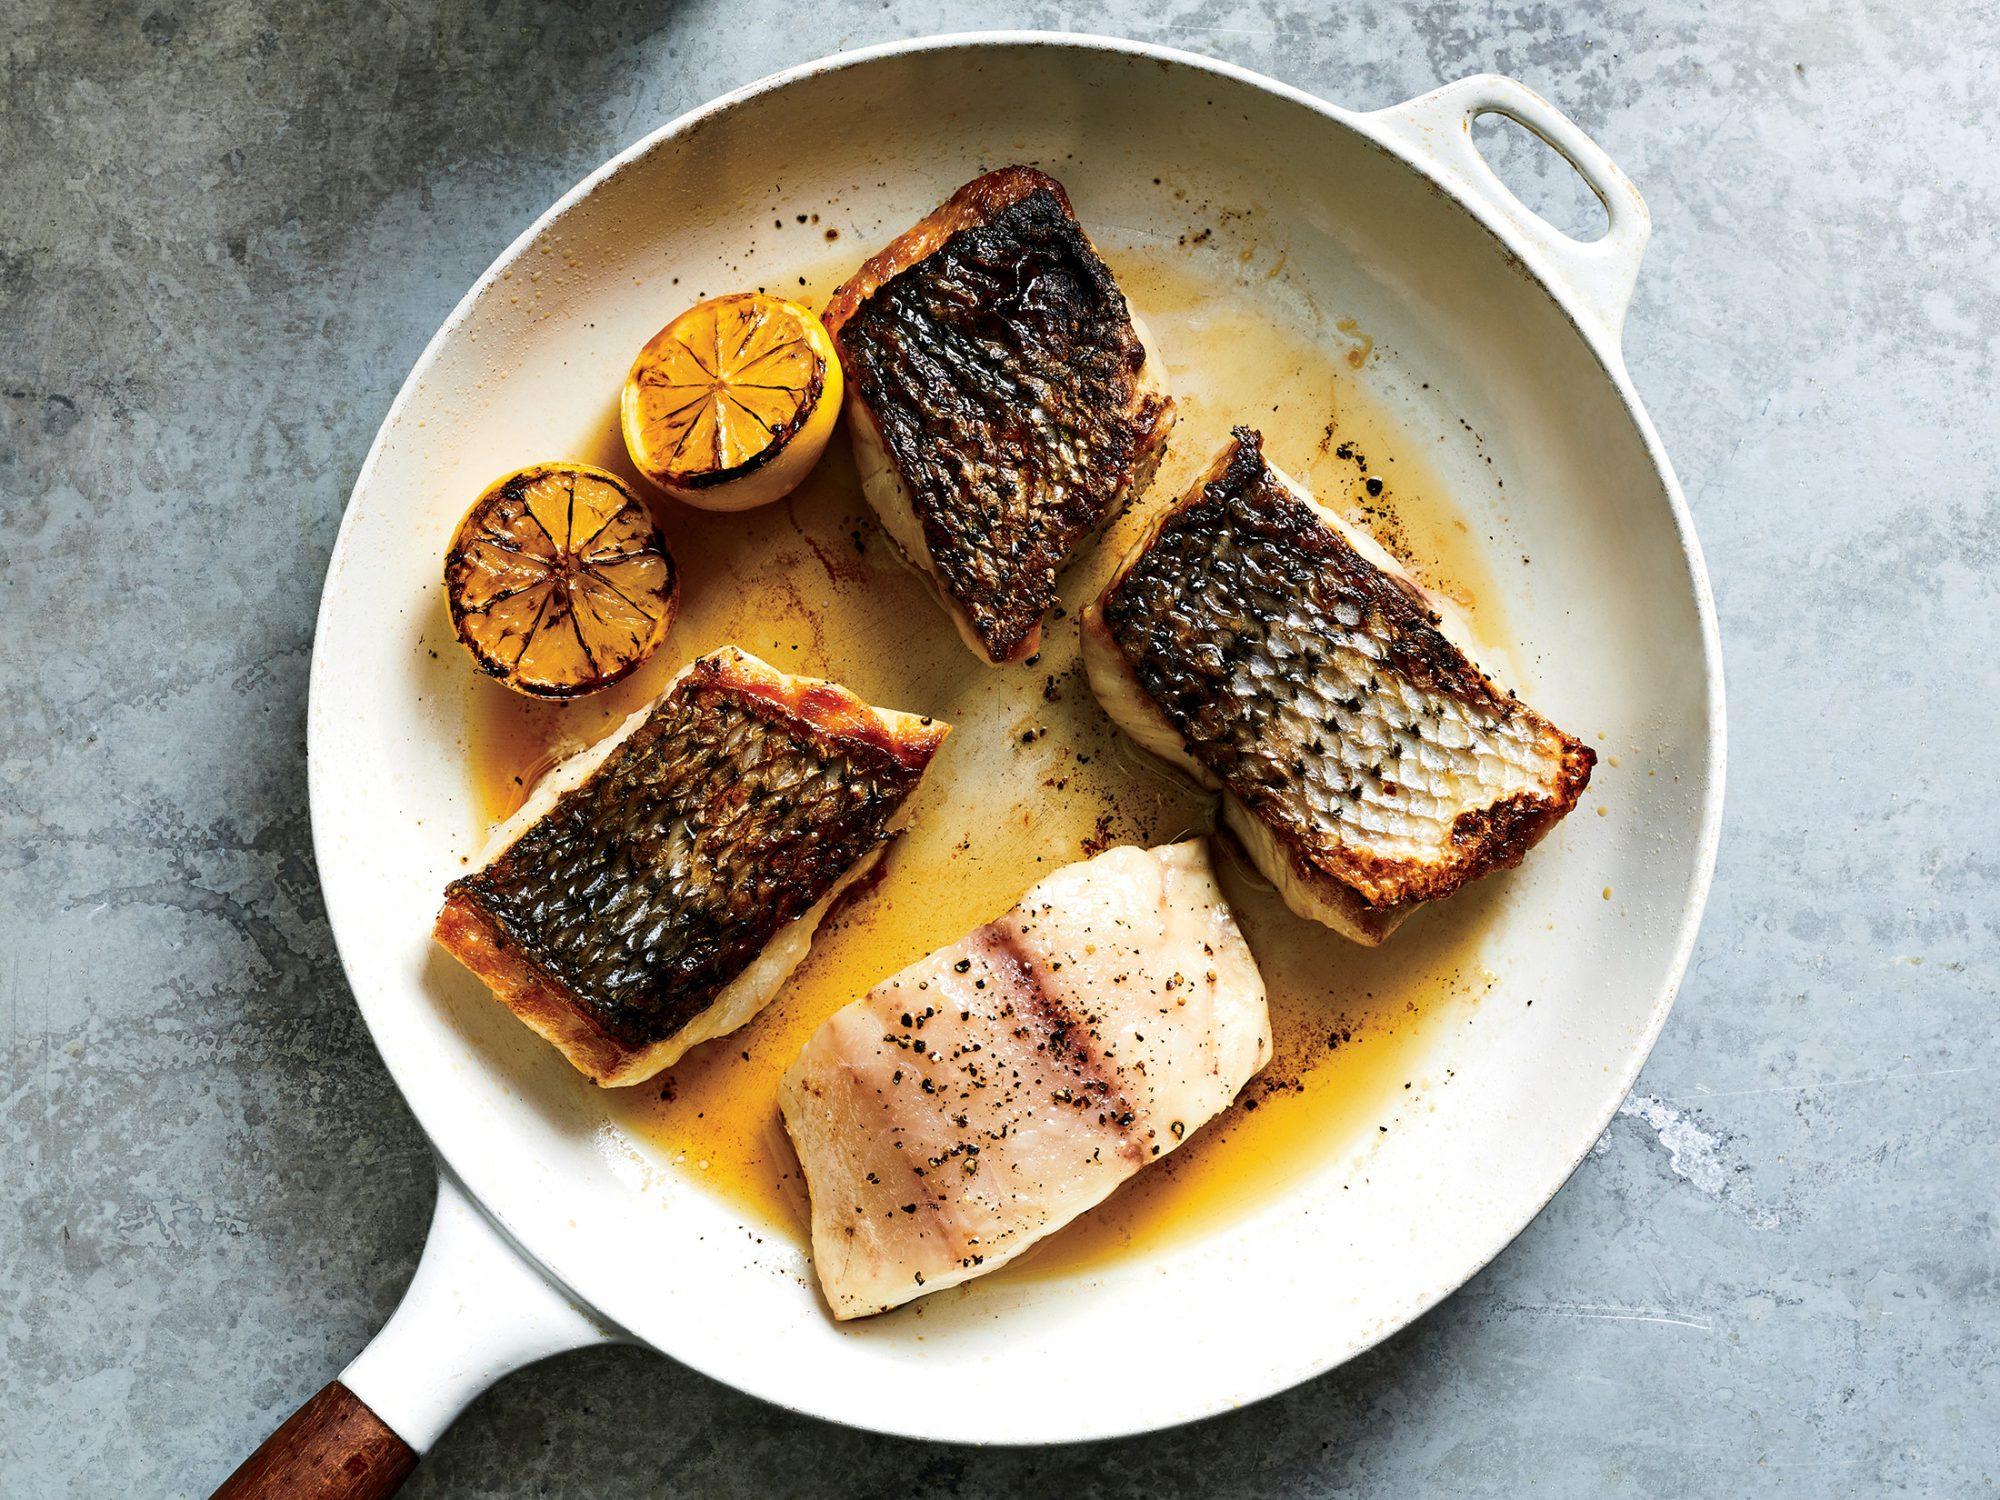 Sautéed Striped Bass in Pan